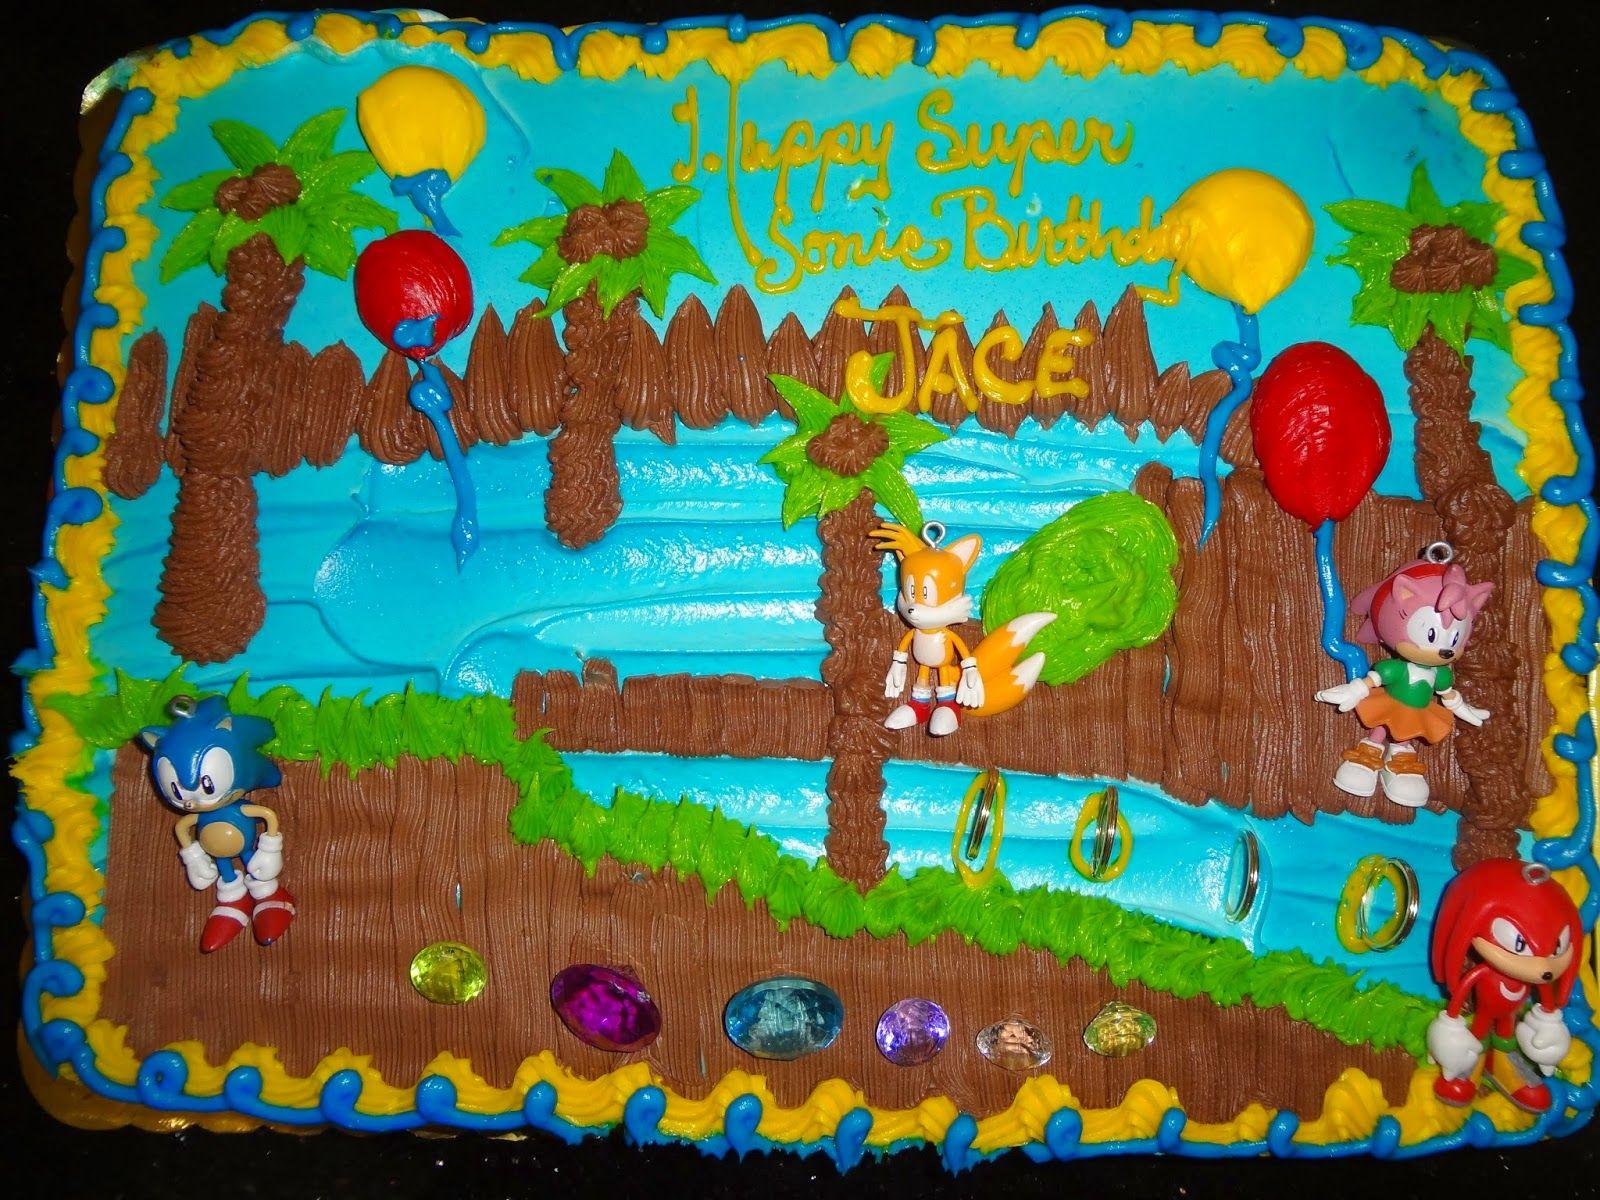 Jaces sonic birthday bash sonic birthday sonic